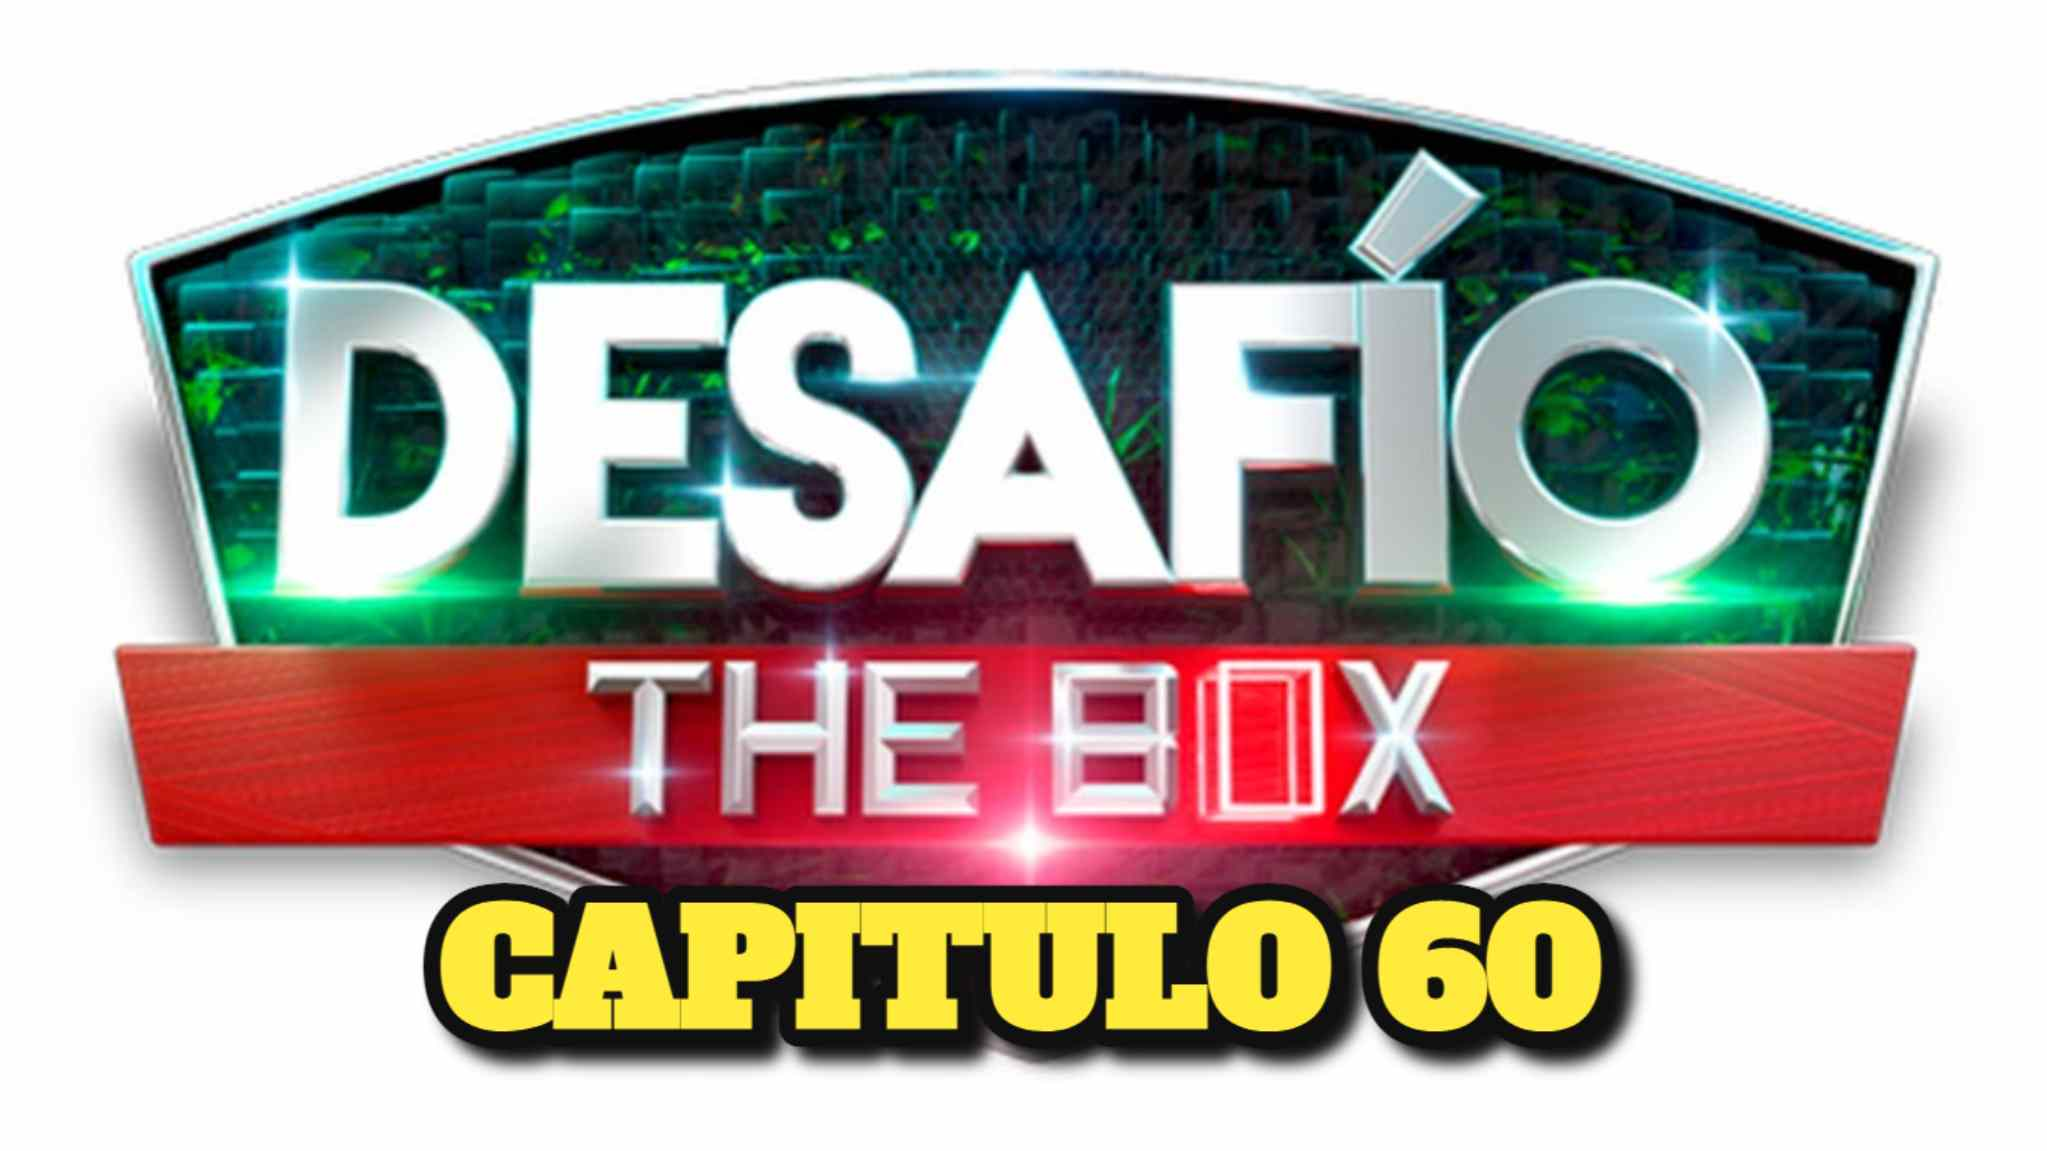 VER: EN VIVO, Desafio The Box 2021 CAPITULO 60; MIRAR AQUI EN VIVO desafio the box en vivo hoy